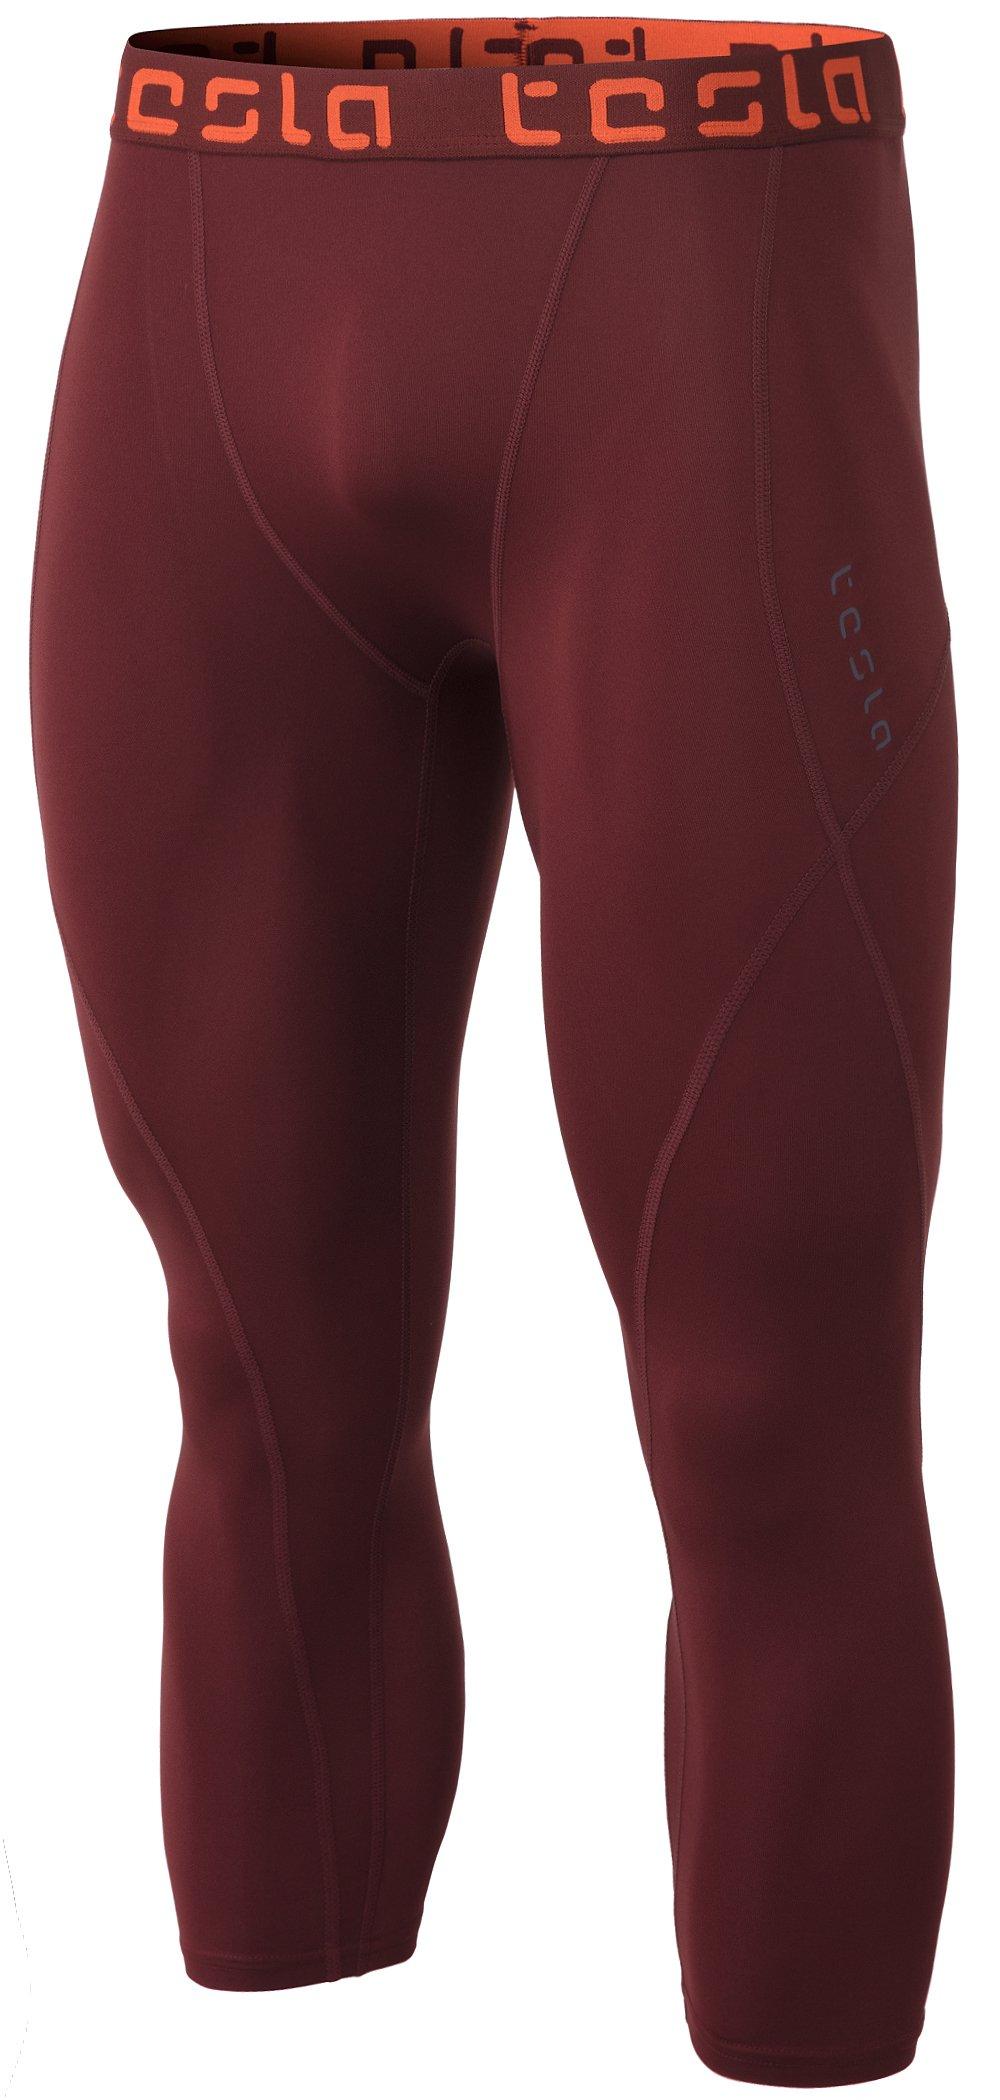 TSLA Men's Compression 3/4 Capri Pants Baselayer